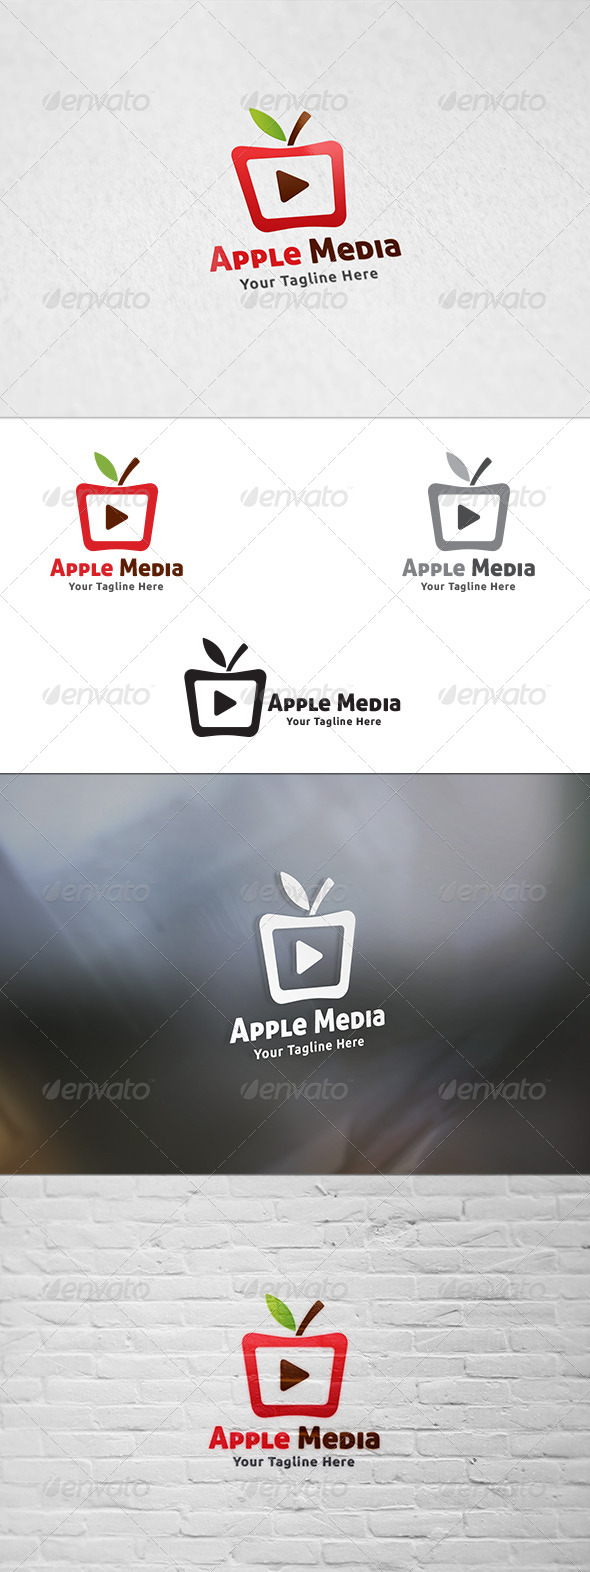 GraphicRiver Apple Media Logo Template 8718175